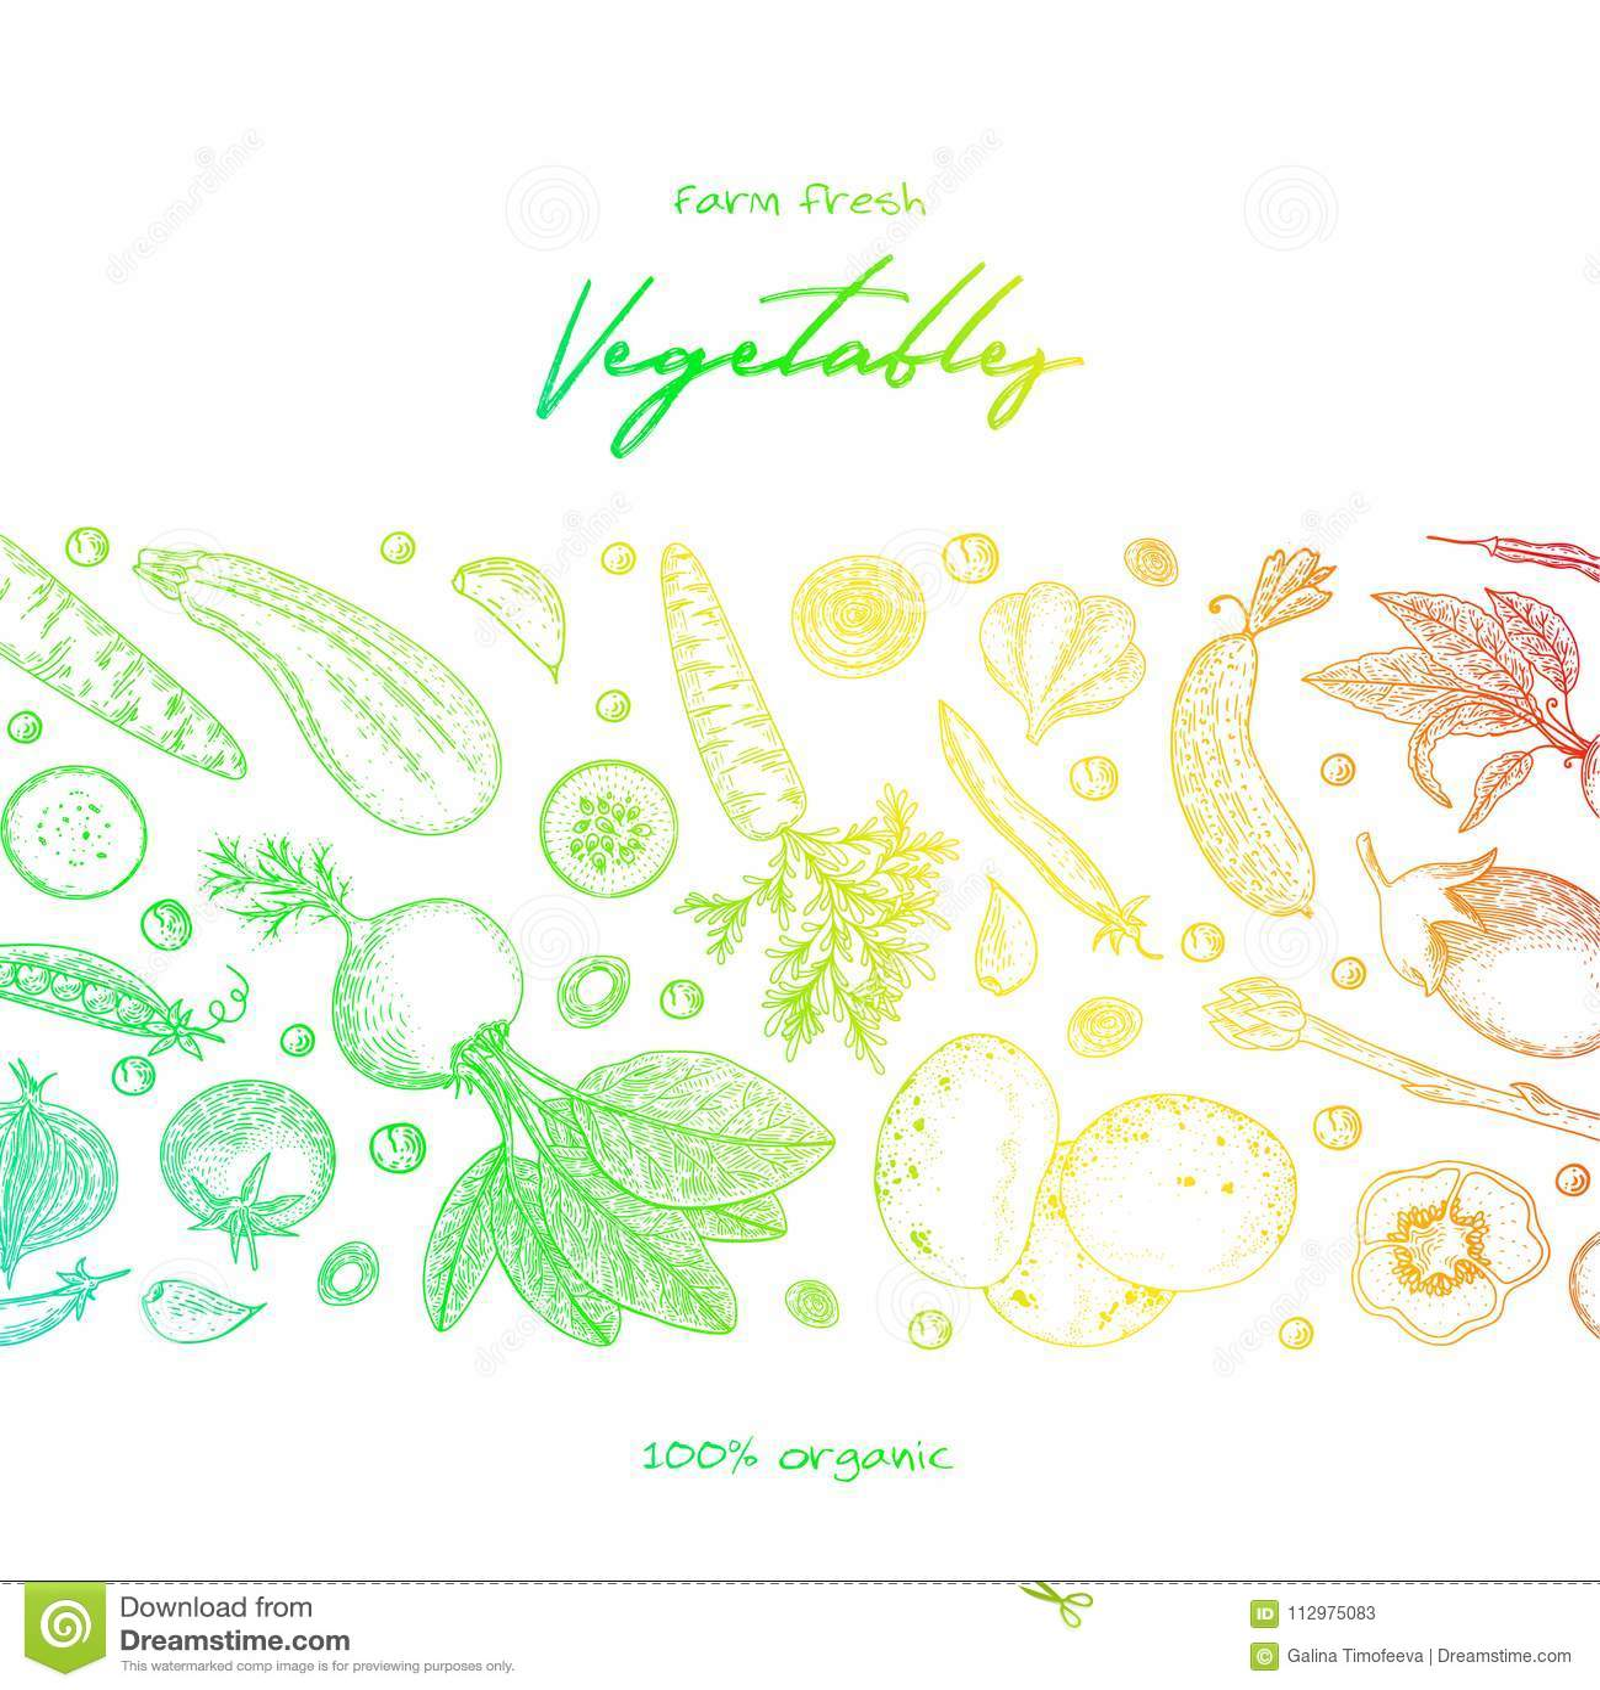 Organic food design template. Fresh vegetables. Hand drawn illustration frame with vegetables. Colorful template design